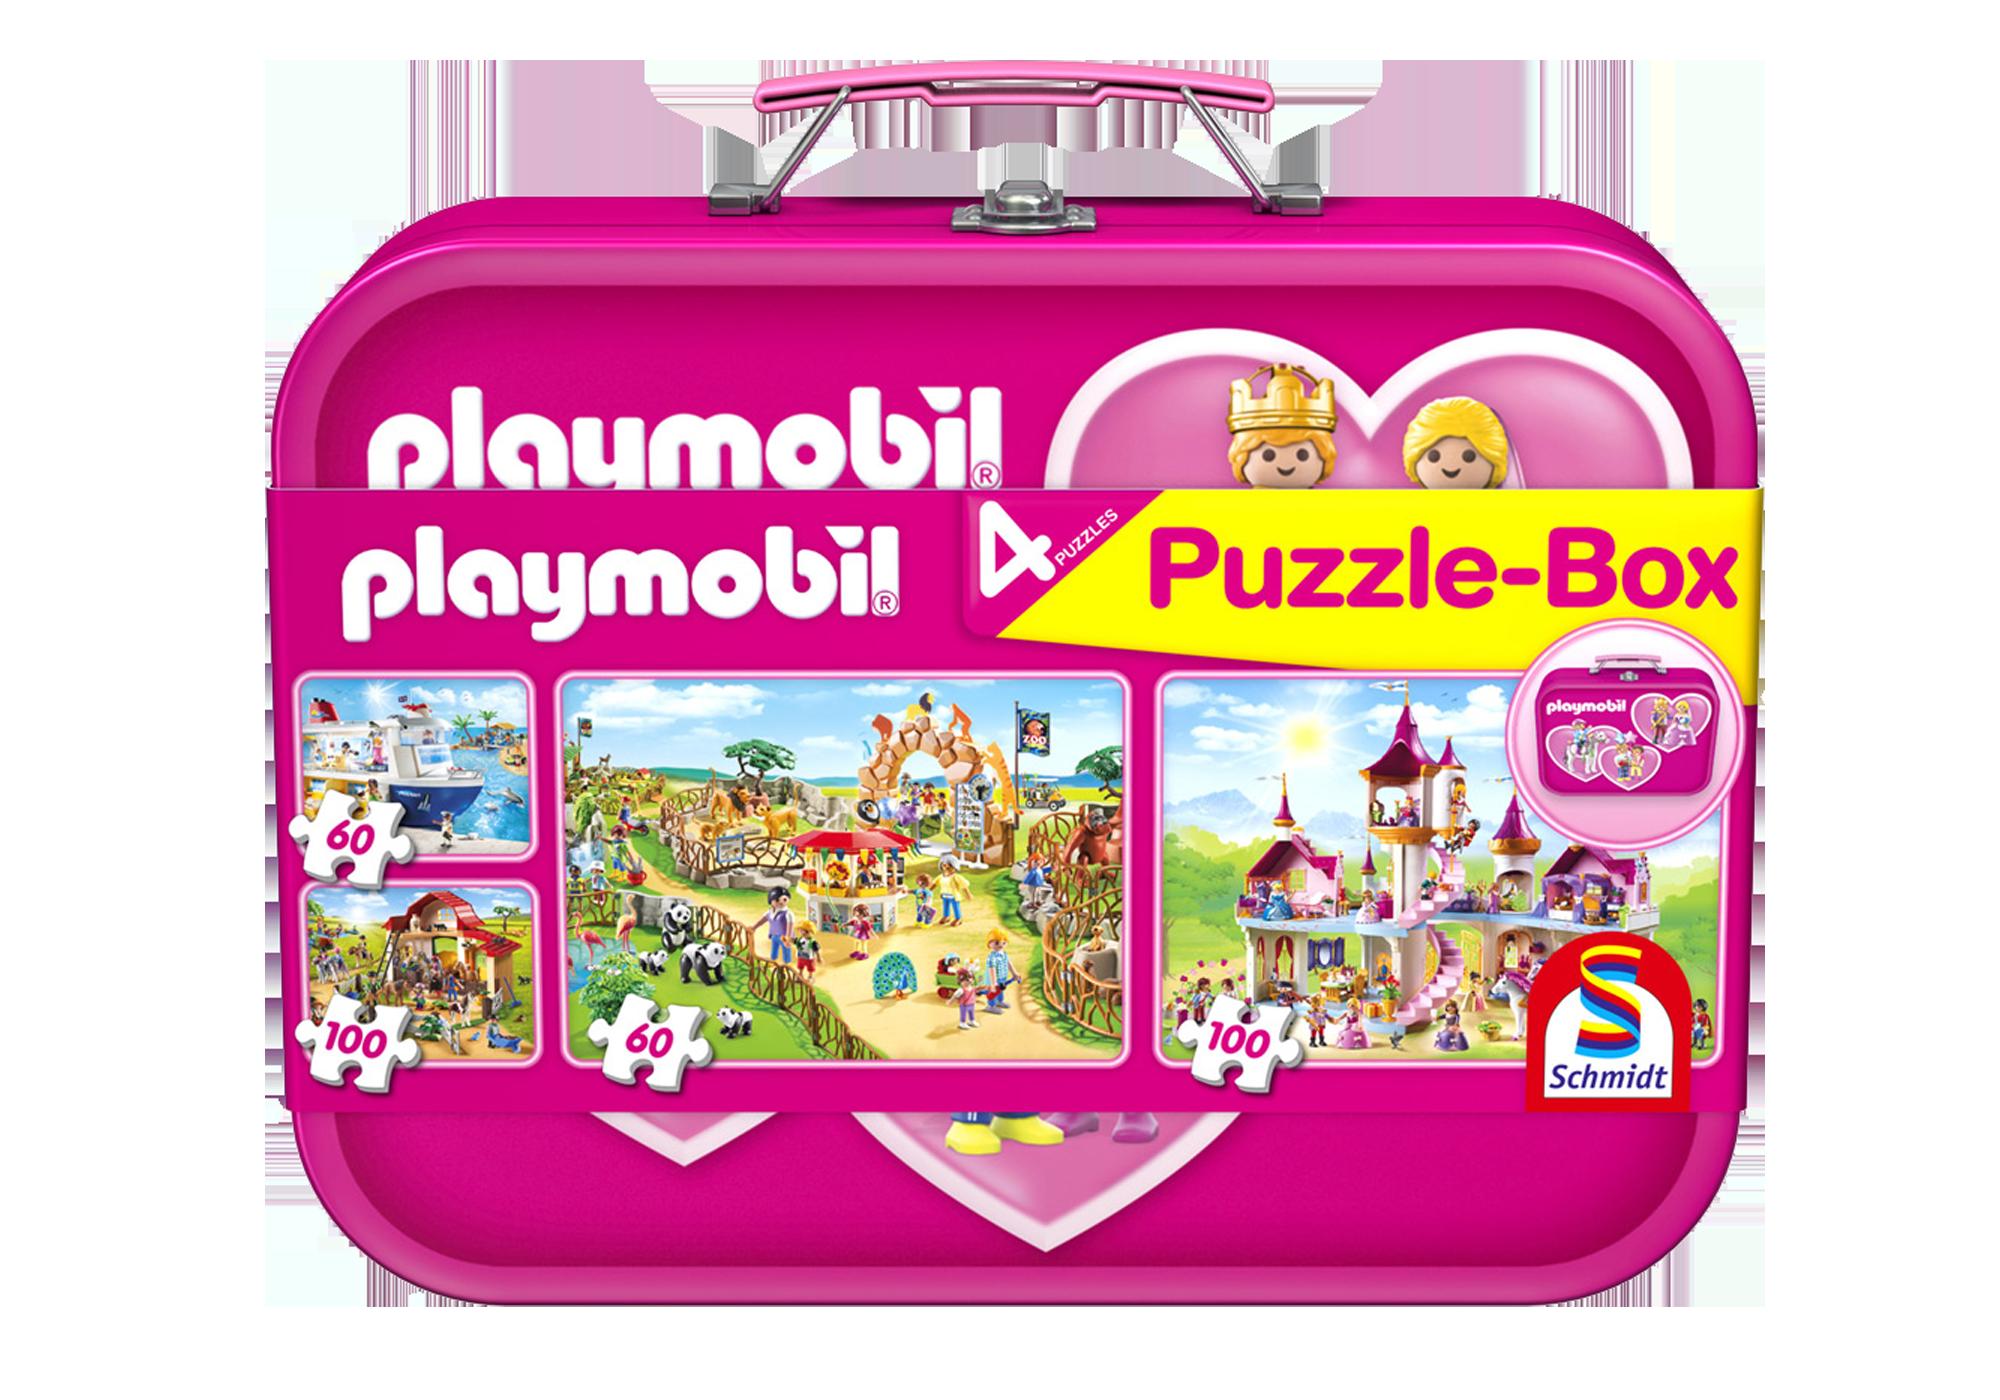 http://media.playmobil.com/i/playmobil/80013_product_detail/Puzzle-Box